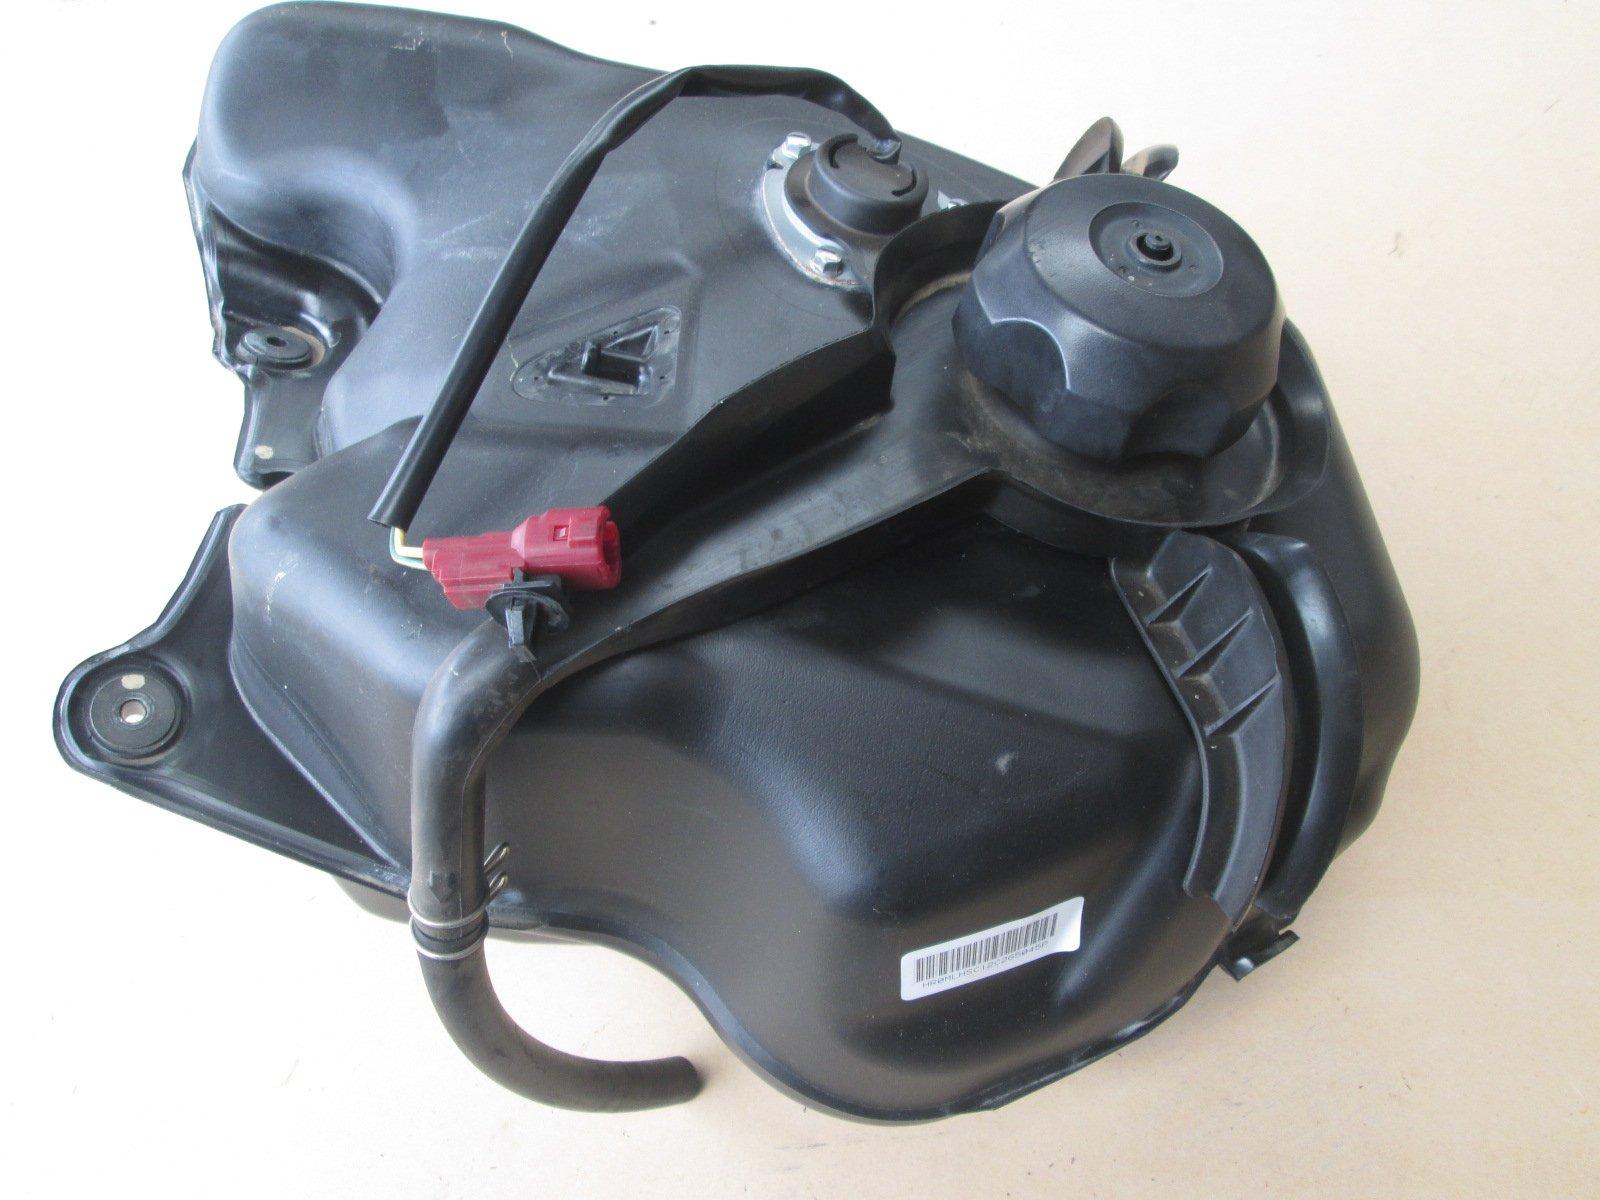 Genuine Honda 2012/13Complete Fuel Tank-HRO-